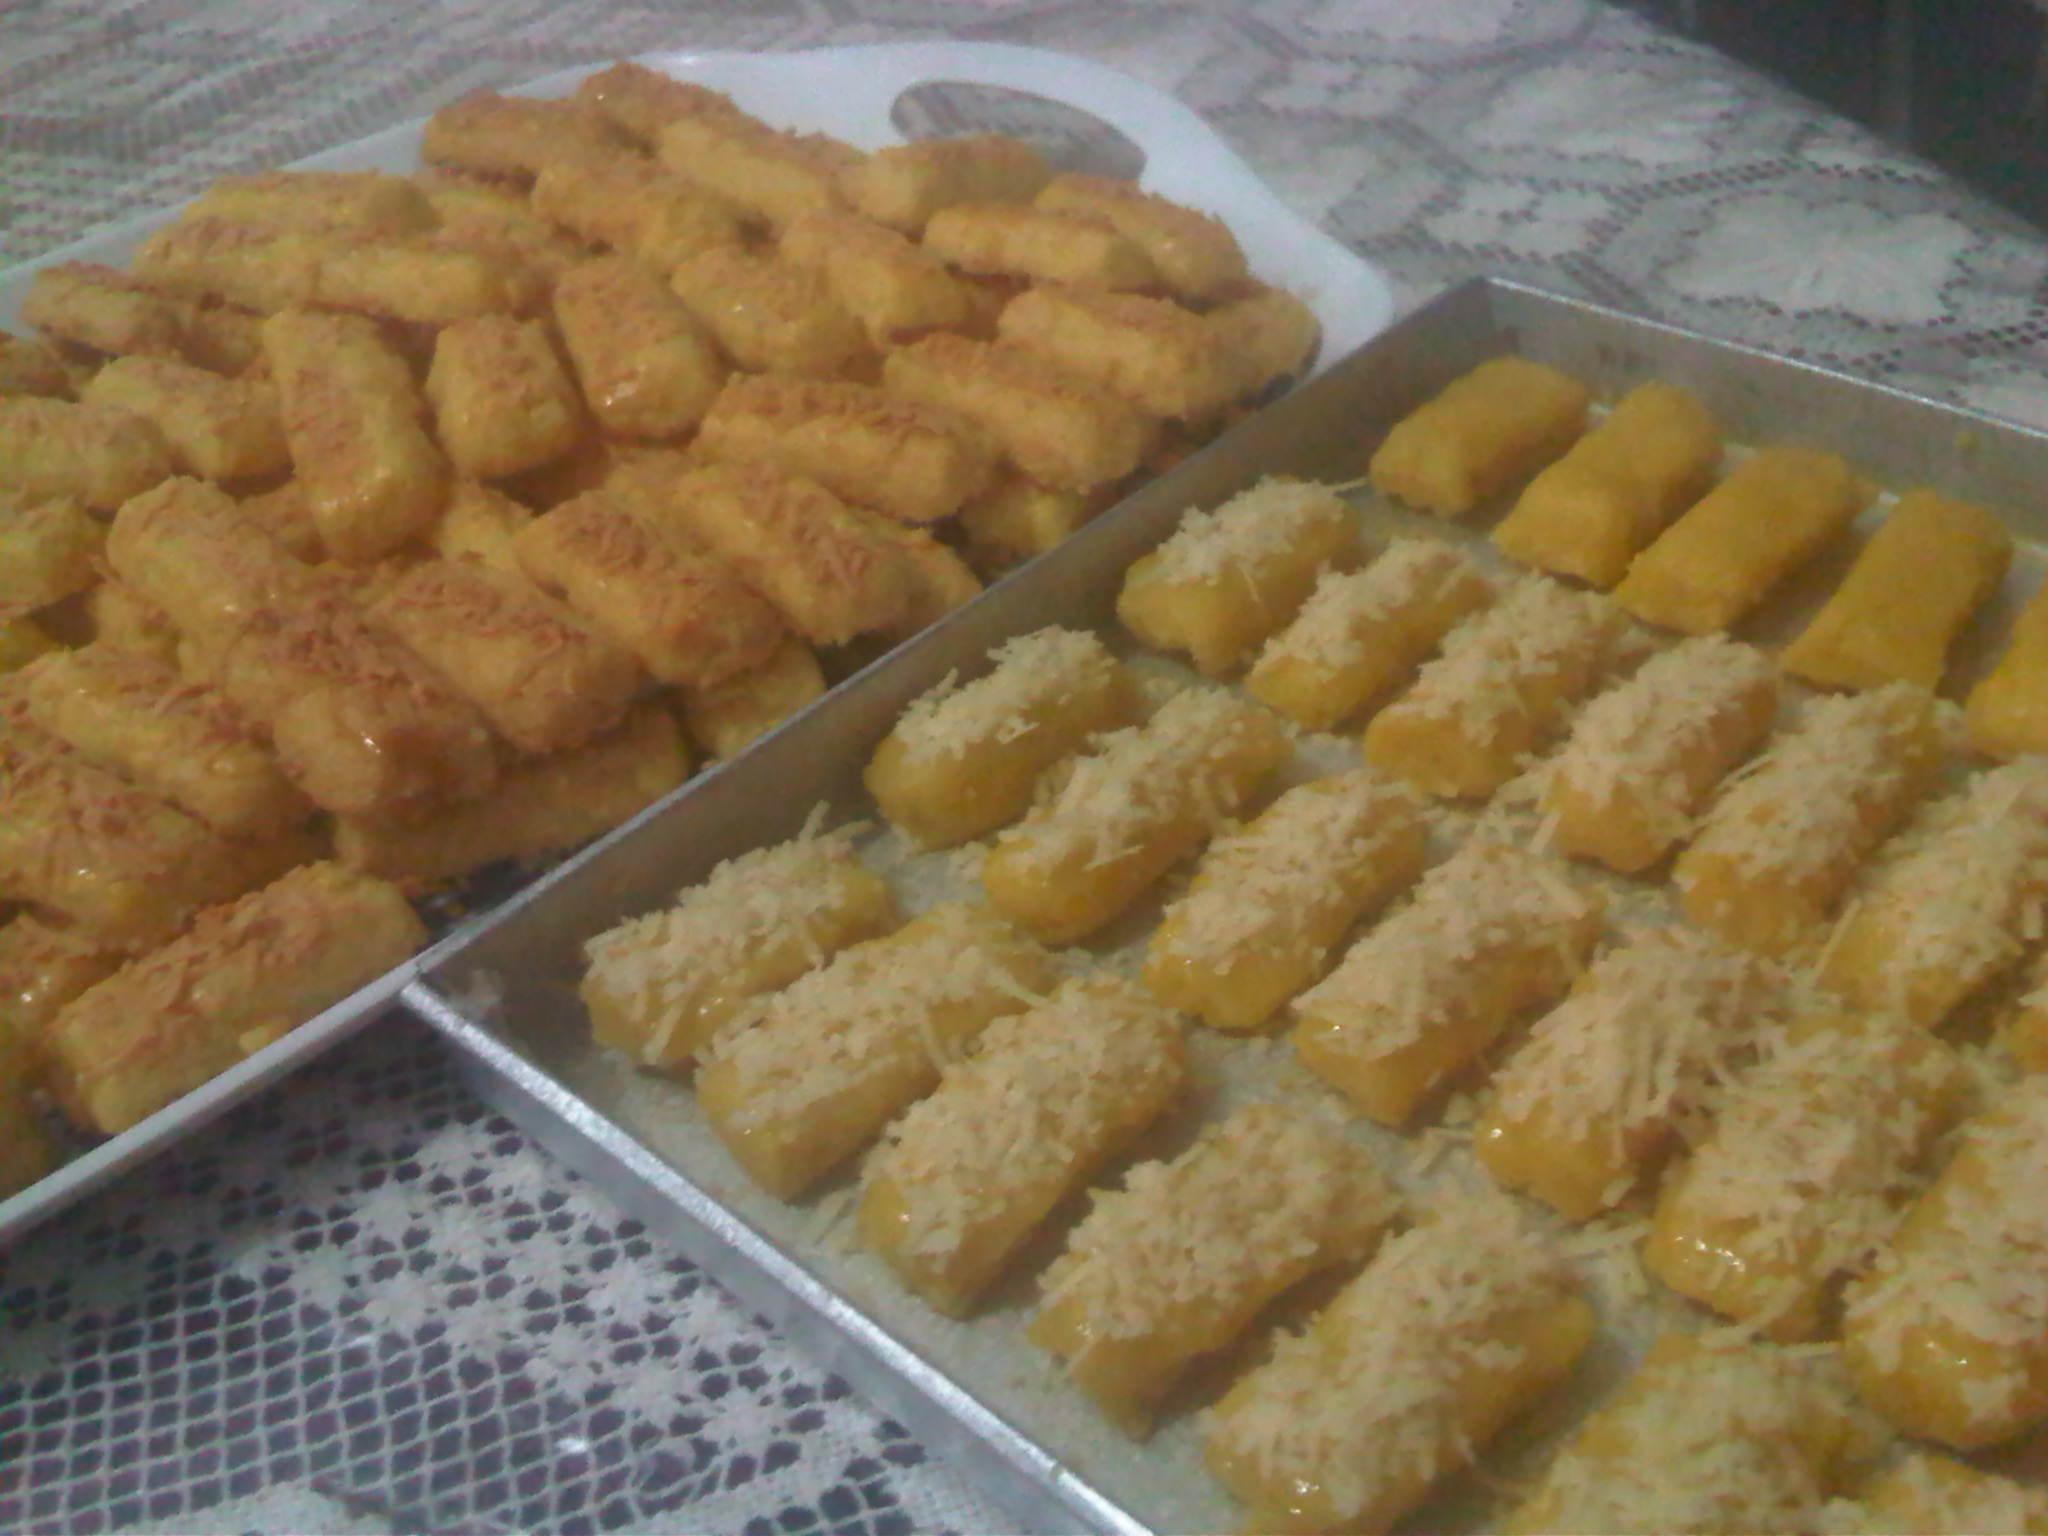 kue lebaraaan, kastengel dan nastar